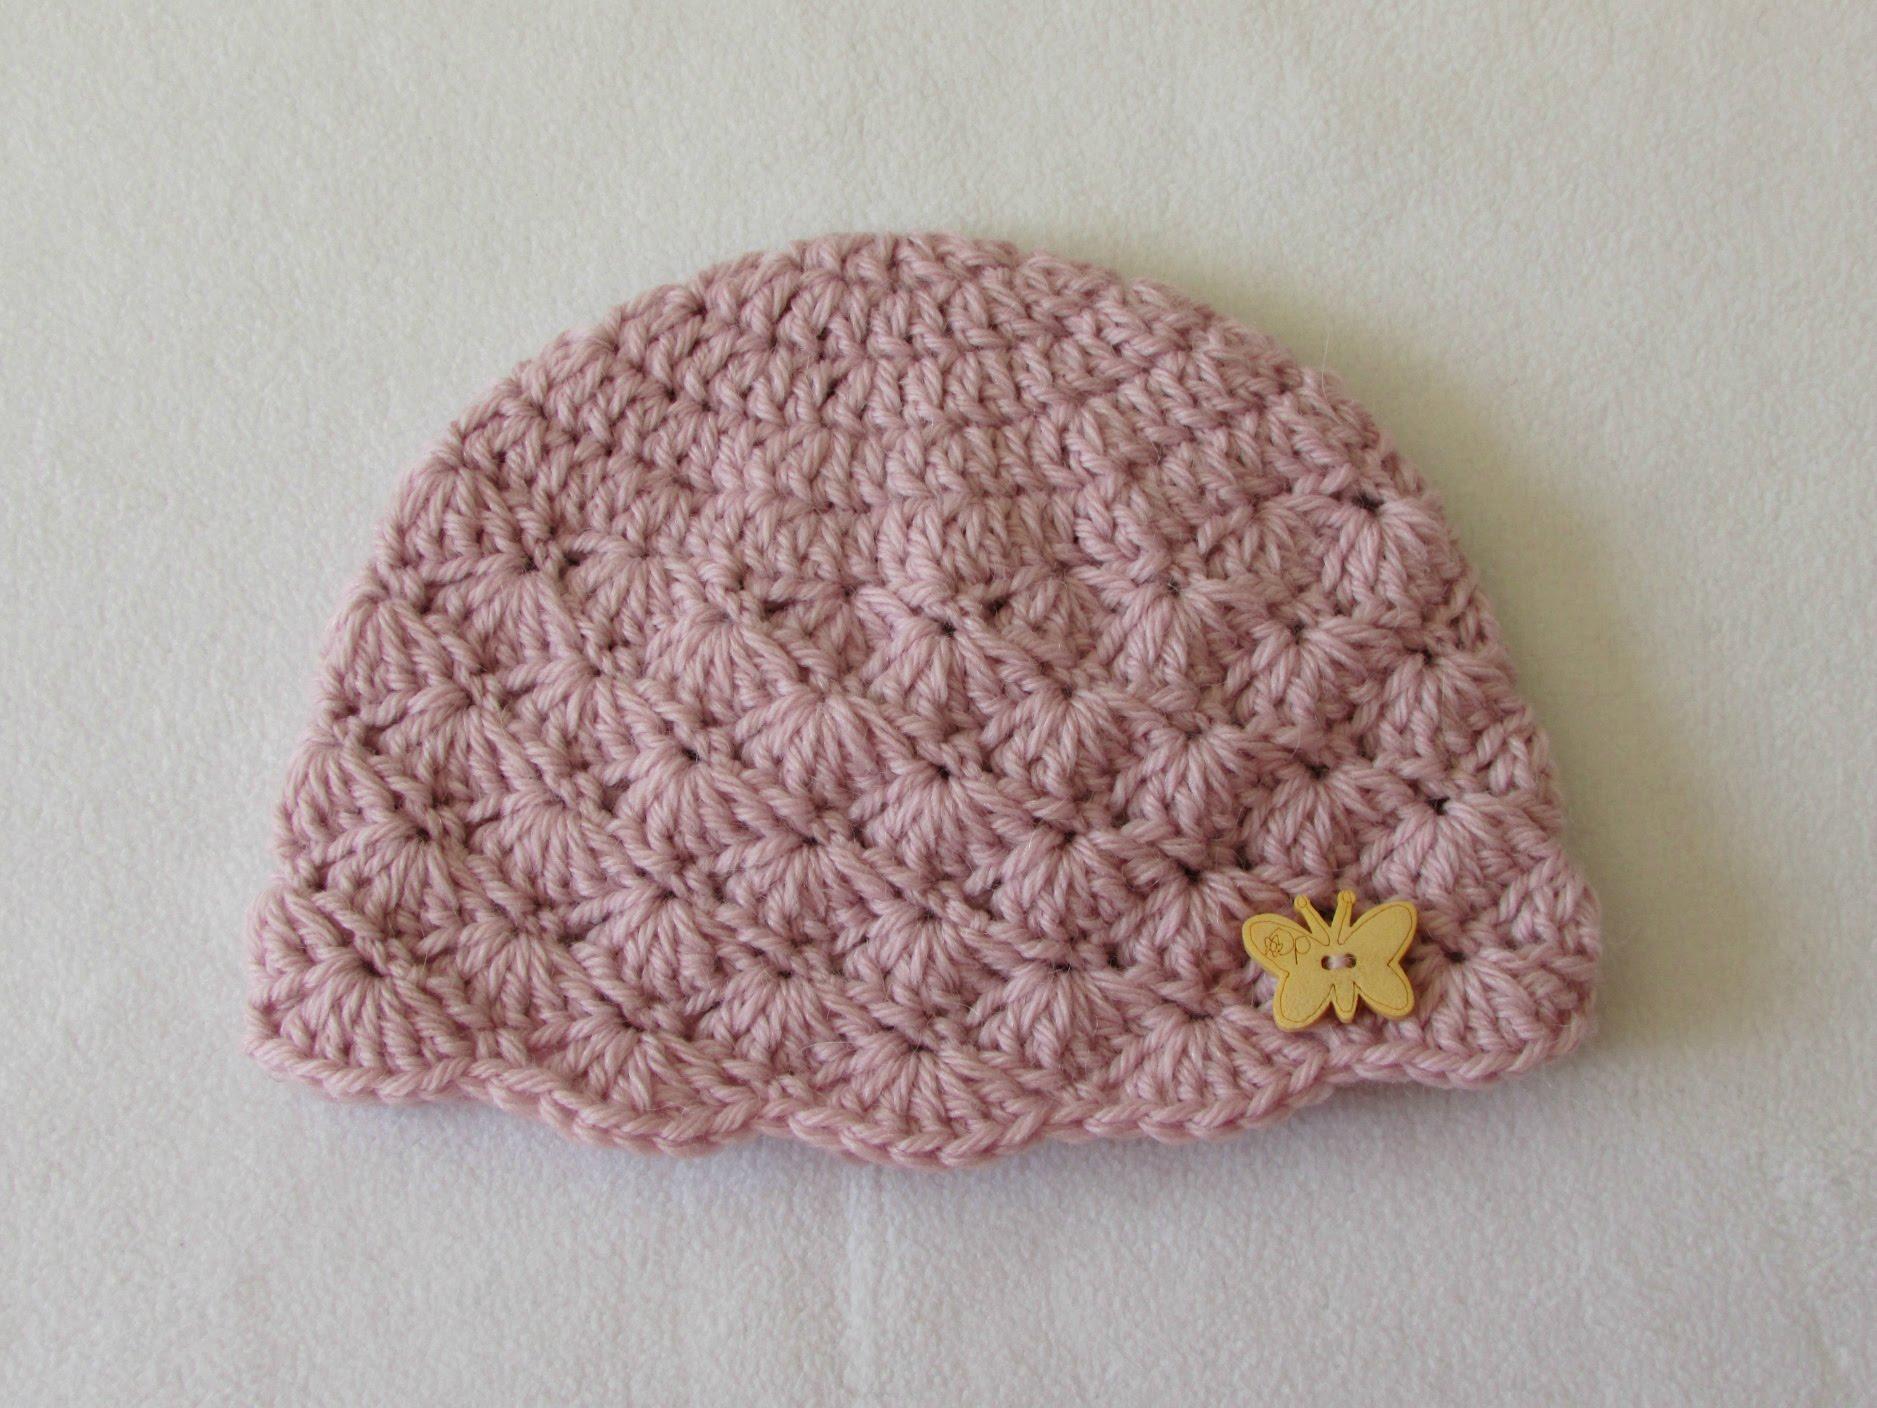 crochet baby hats how to crochet a cute baby girlu0027s hat for beginners - youtube intzxkf